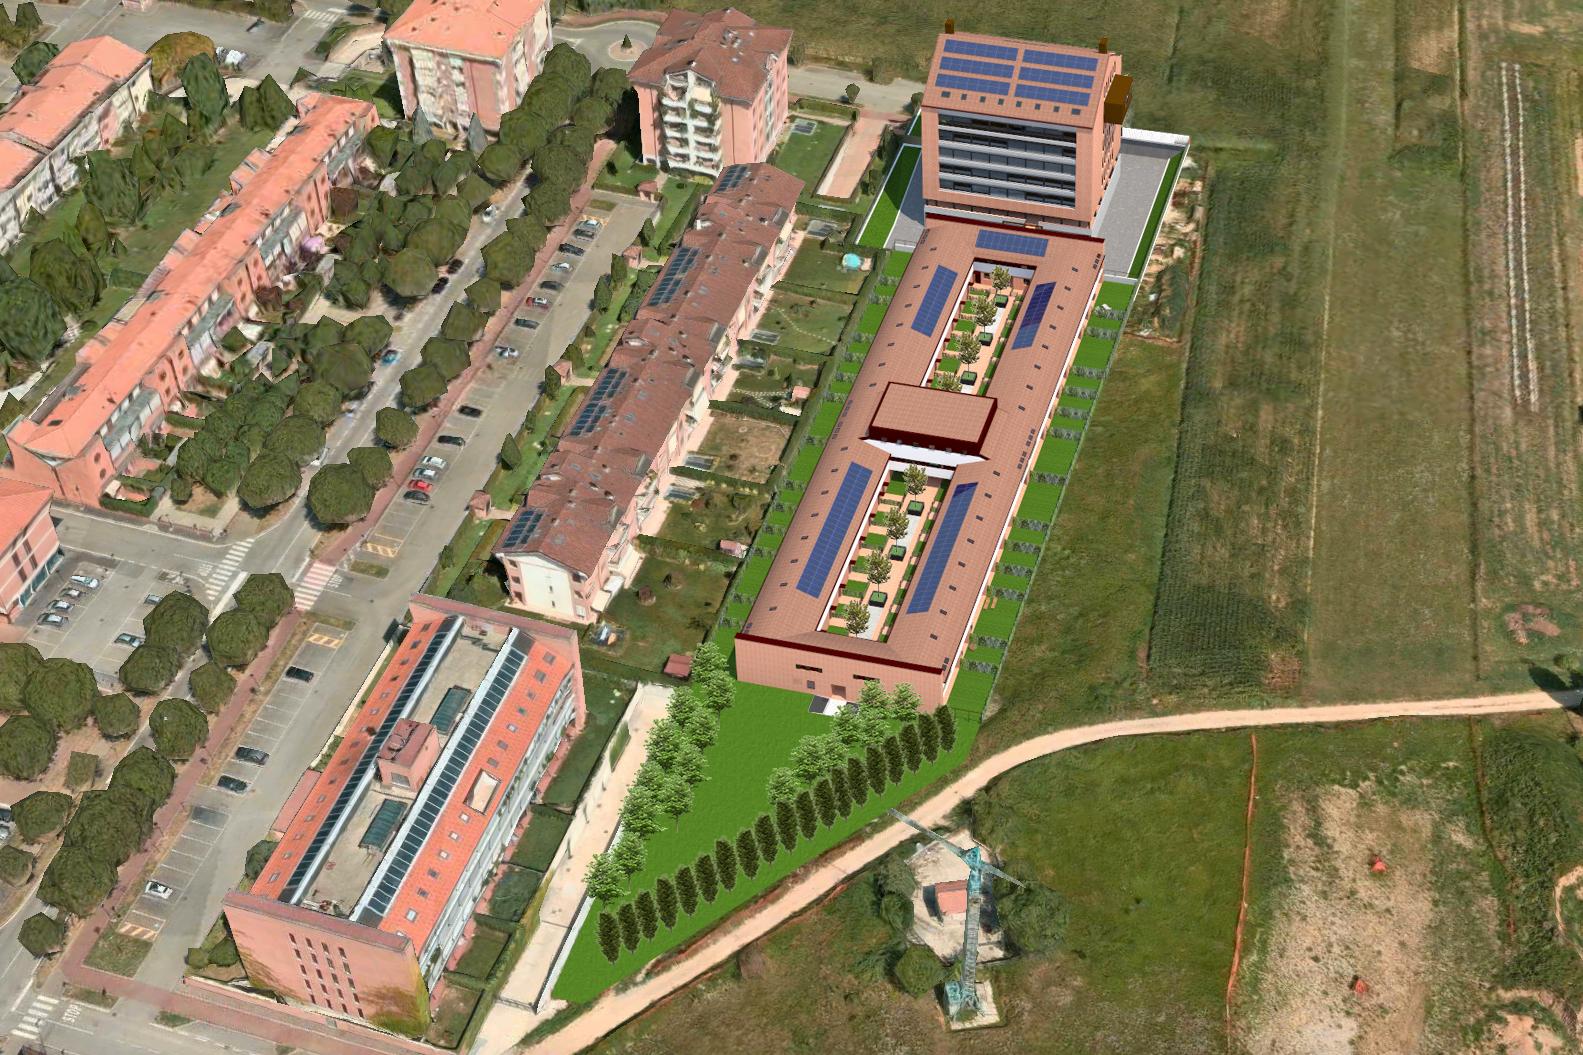 H. Edifici quartiere via Vismara